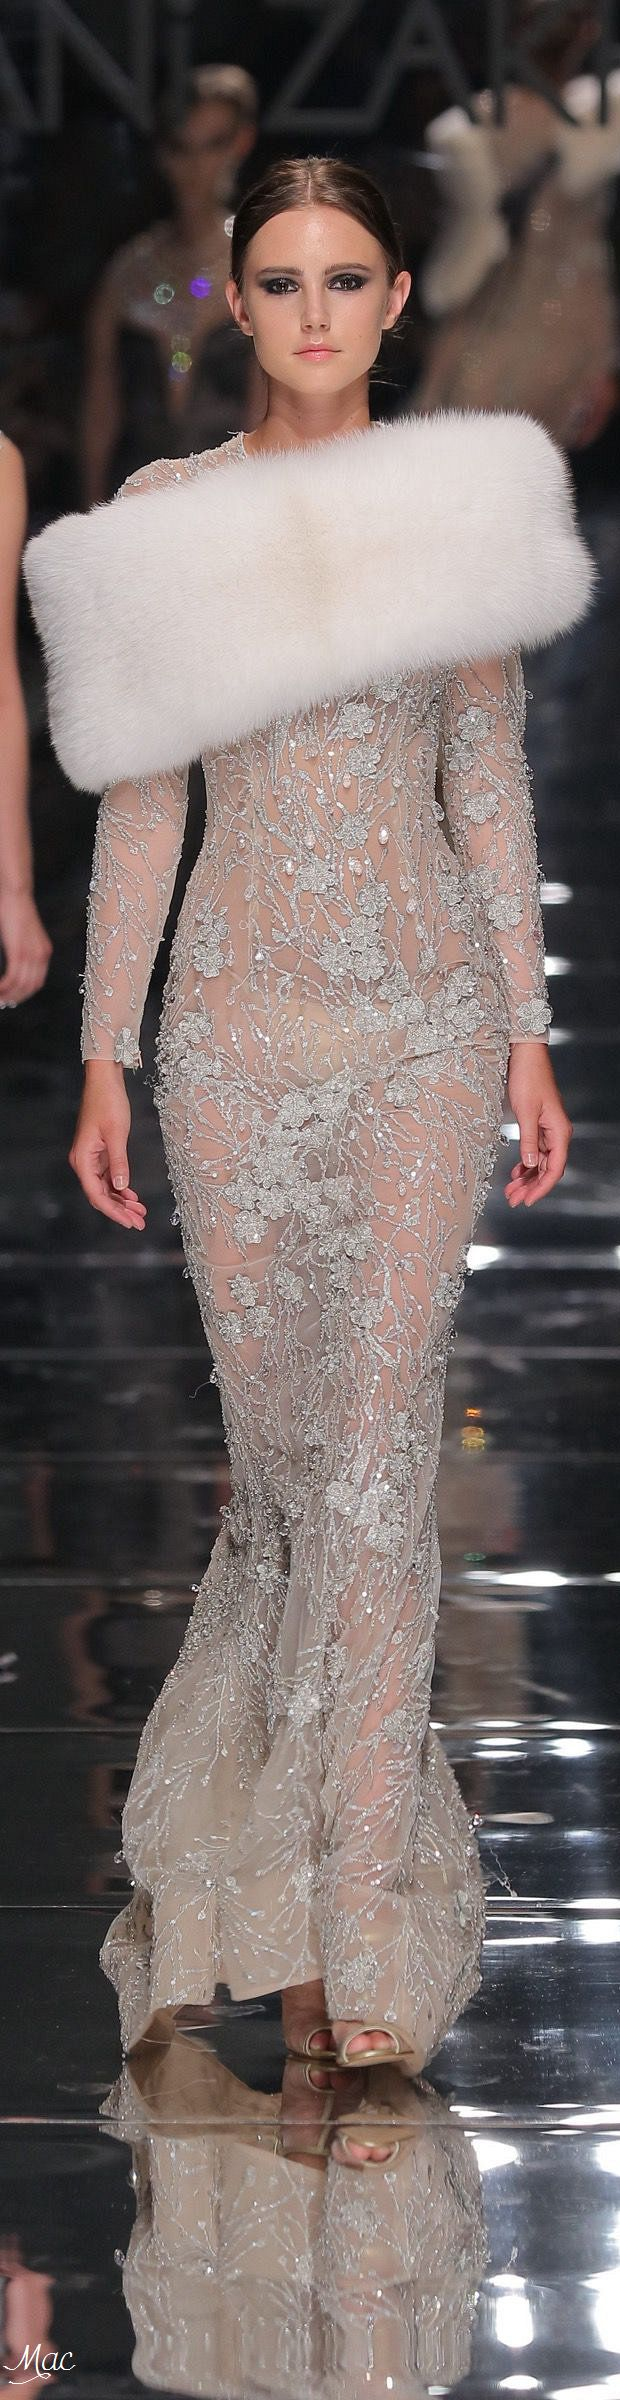 Rosamaria G Frangini | High Chic Fashion | MM&Co | Fall 2016 Haute Couture - Rani Zakhem